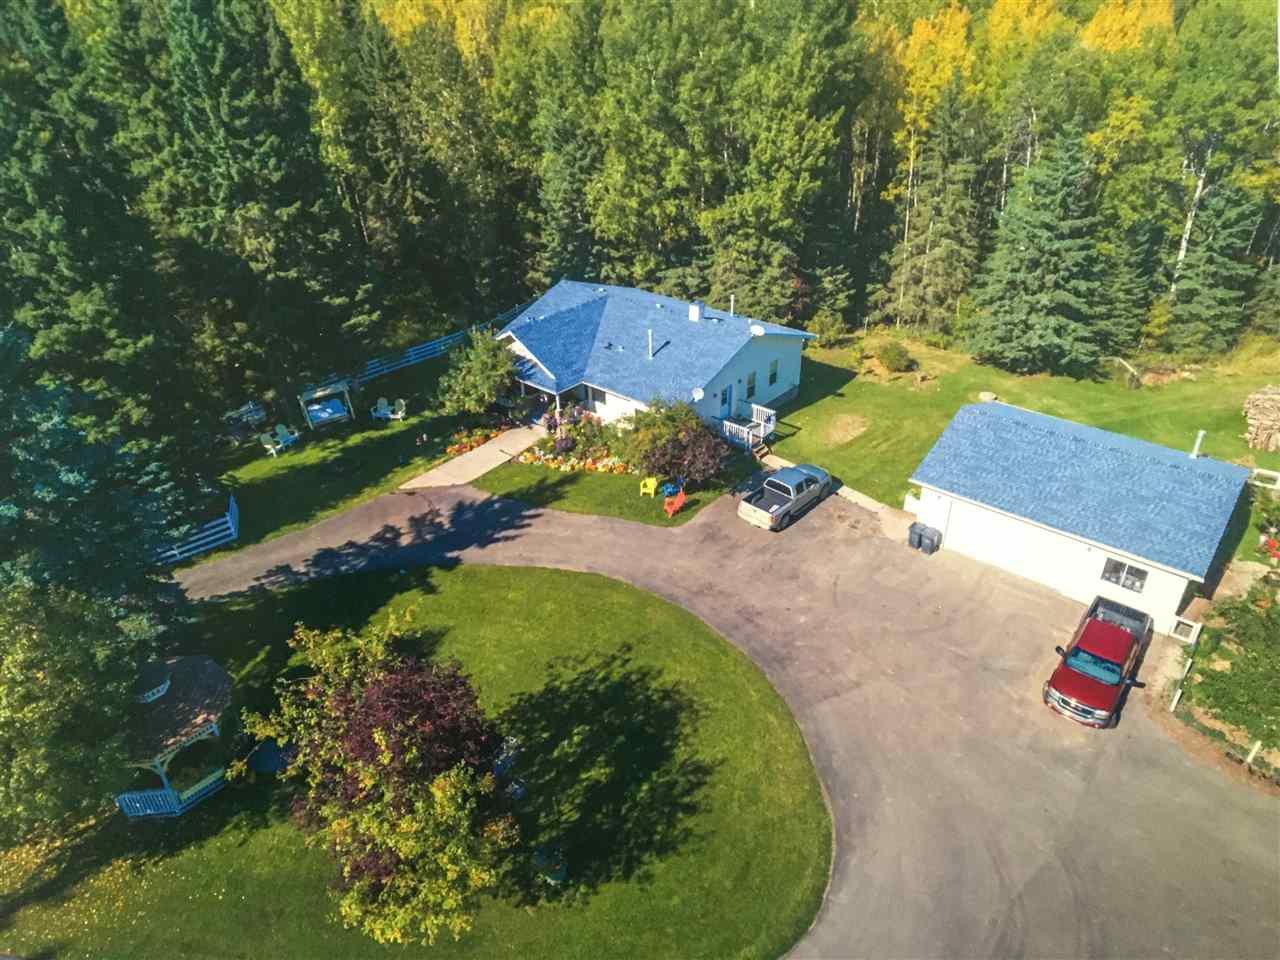 Main Photo: 8324 Hwy 621: Rural Brazeau County House for sale : MLS®# E4208132